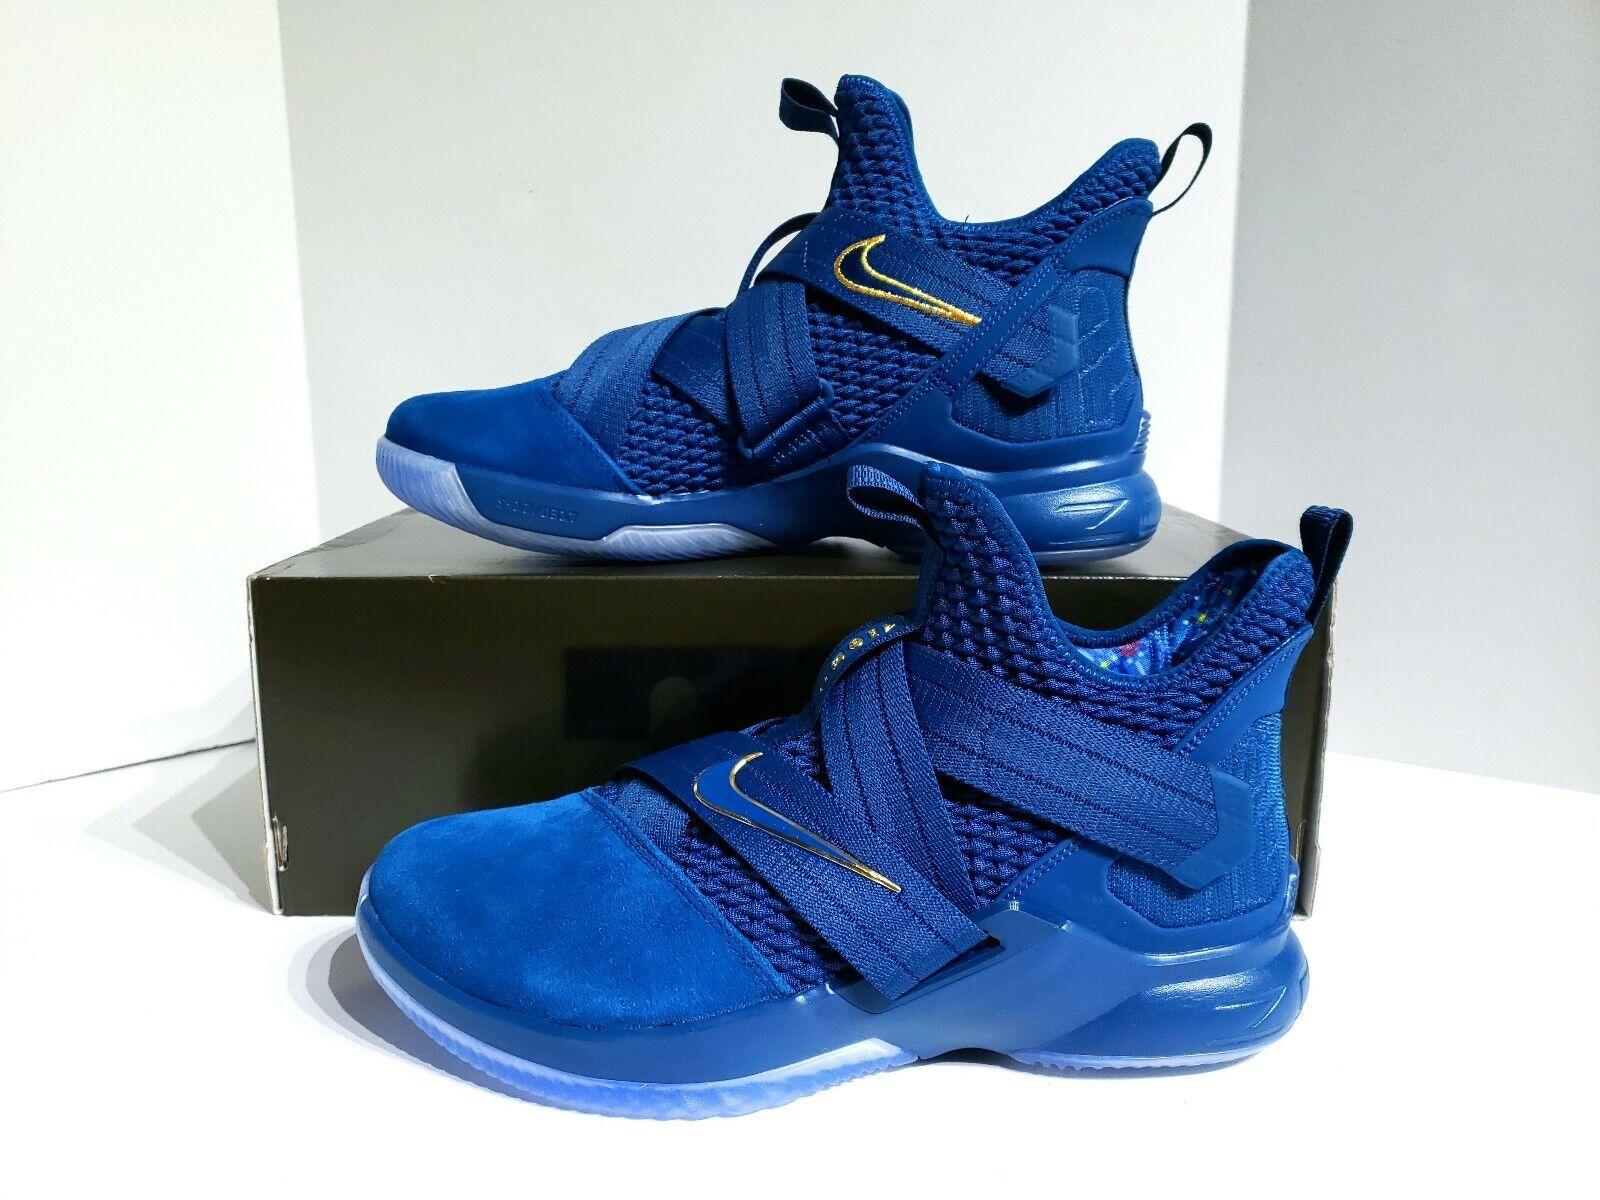 216d383cb13d Nike Lebron Soldier XII SFG Agimat Ao4054-400 Blue Aegean Shoes Mens ...